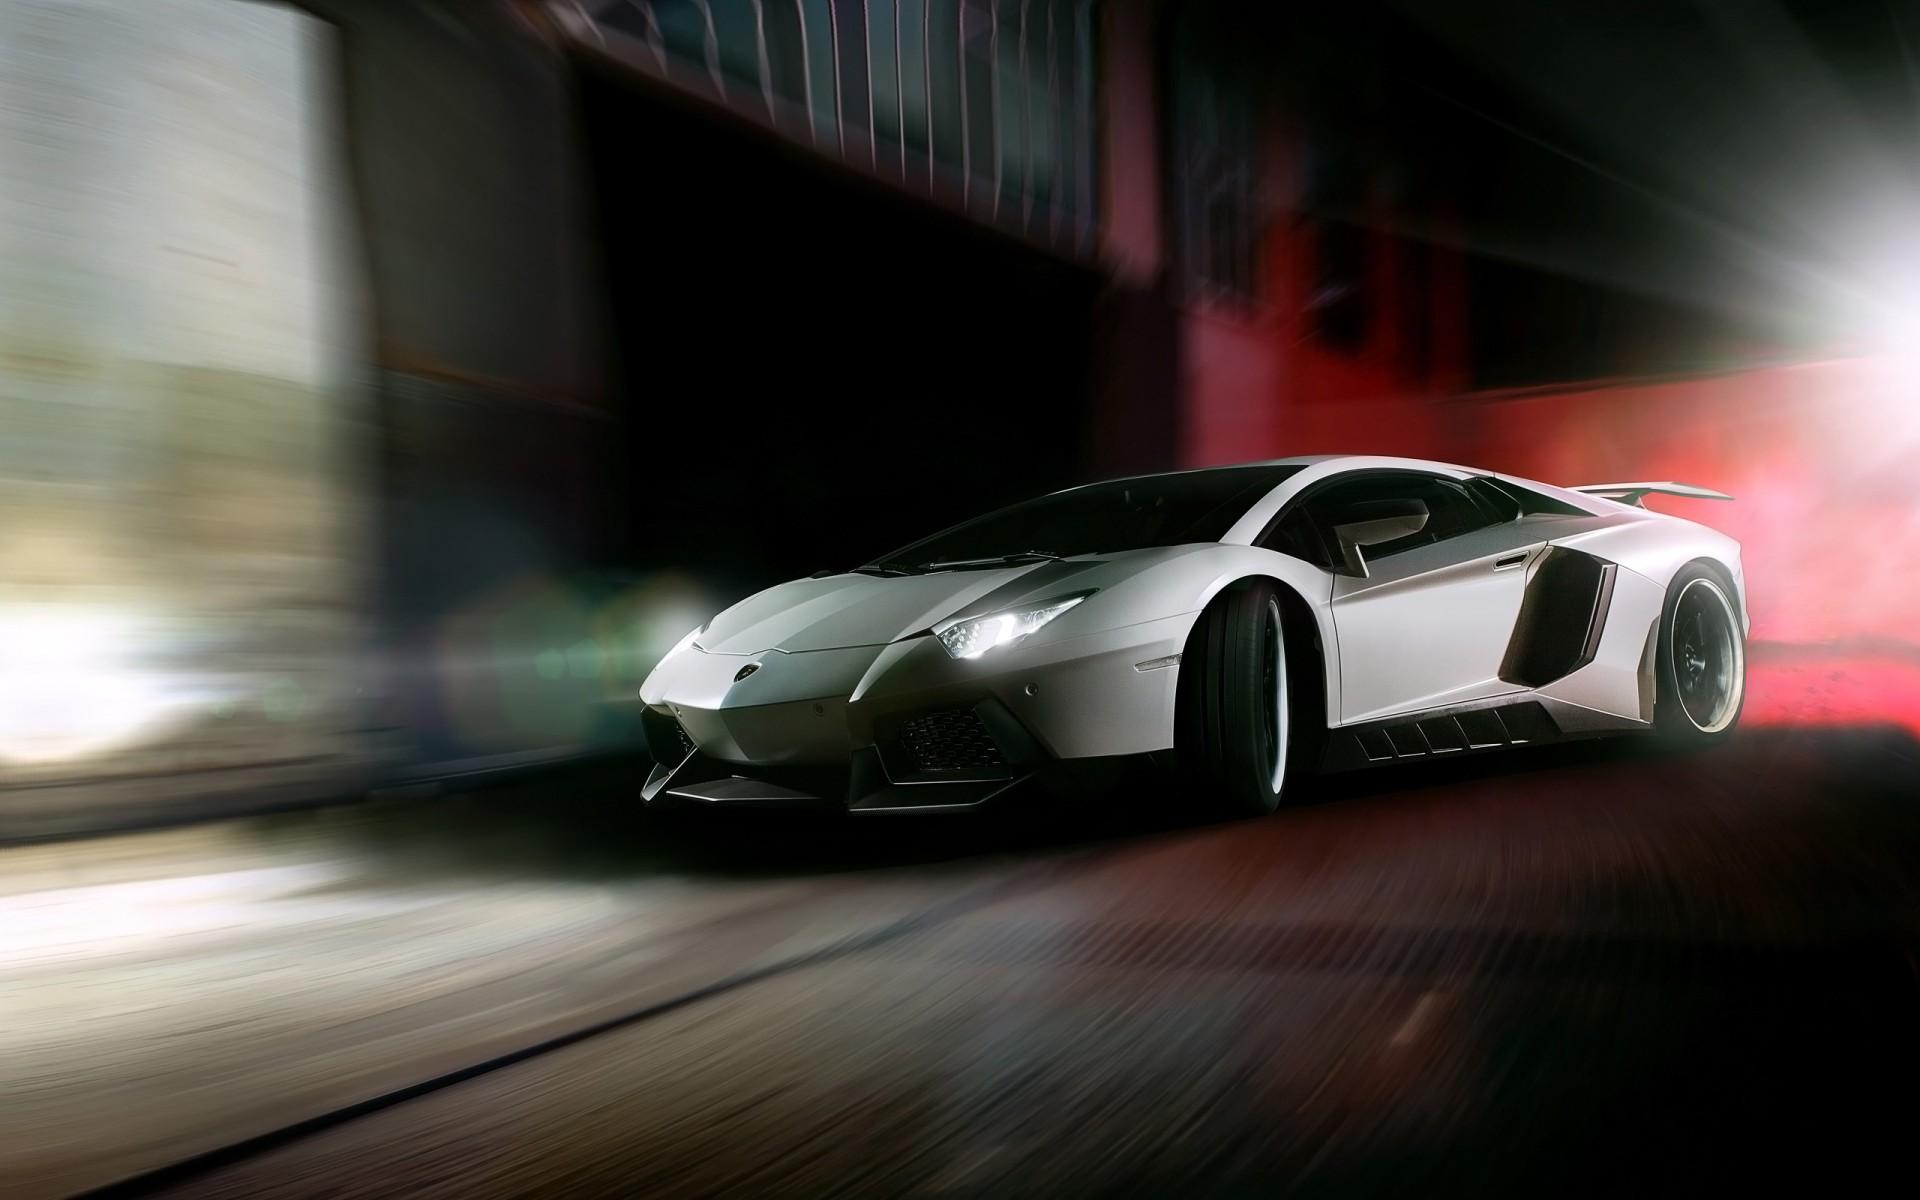 2013 Novitec Torado Lamborghini Aventador Wallpaper in 1920x1200 ...